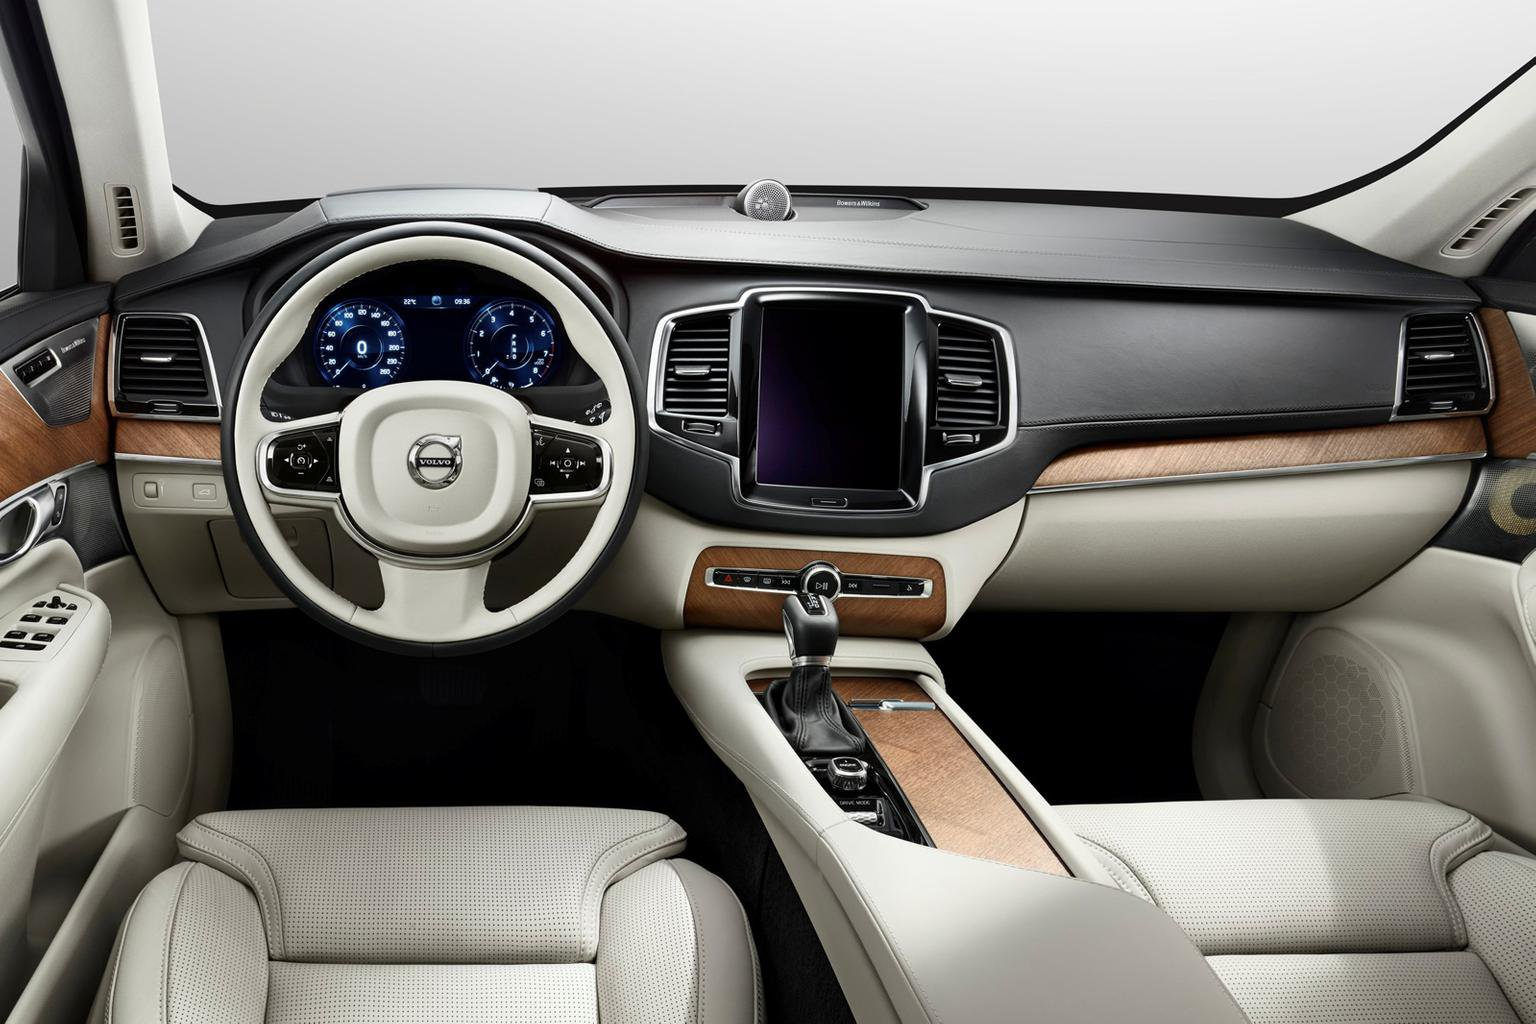 2015 Volvo XC90 cabin revealed